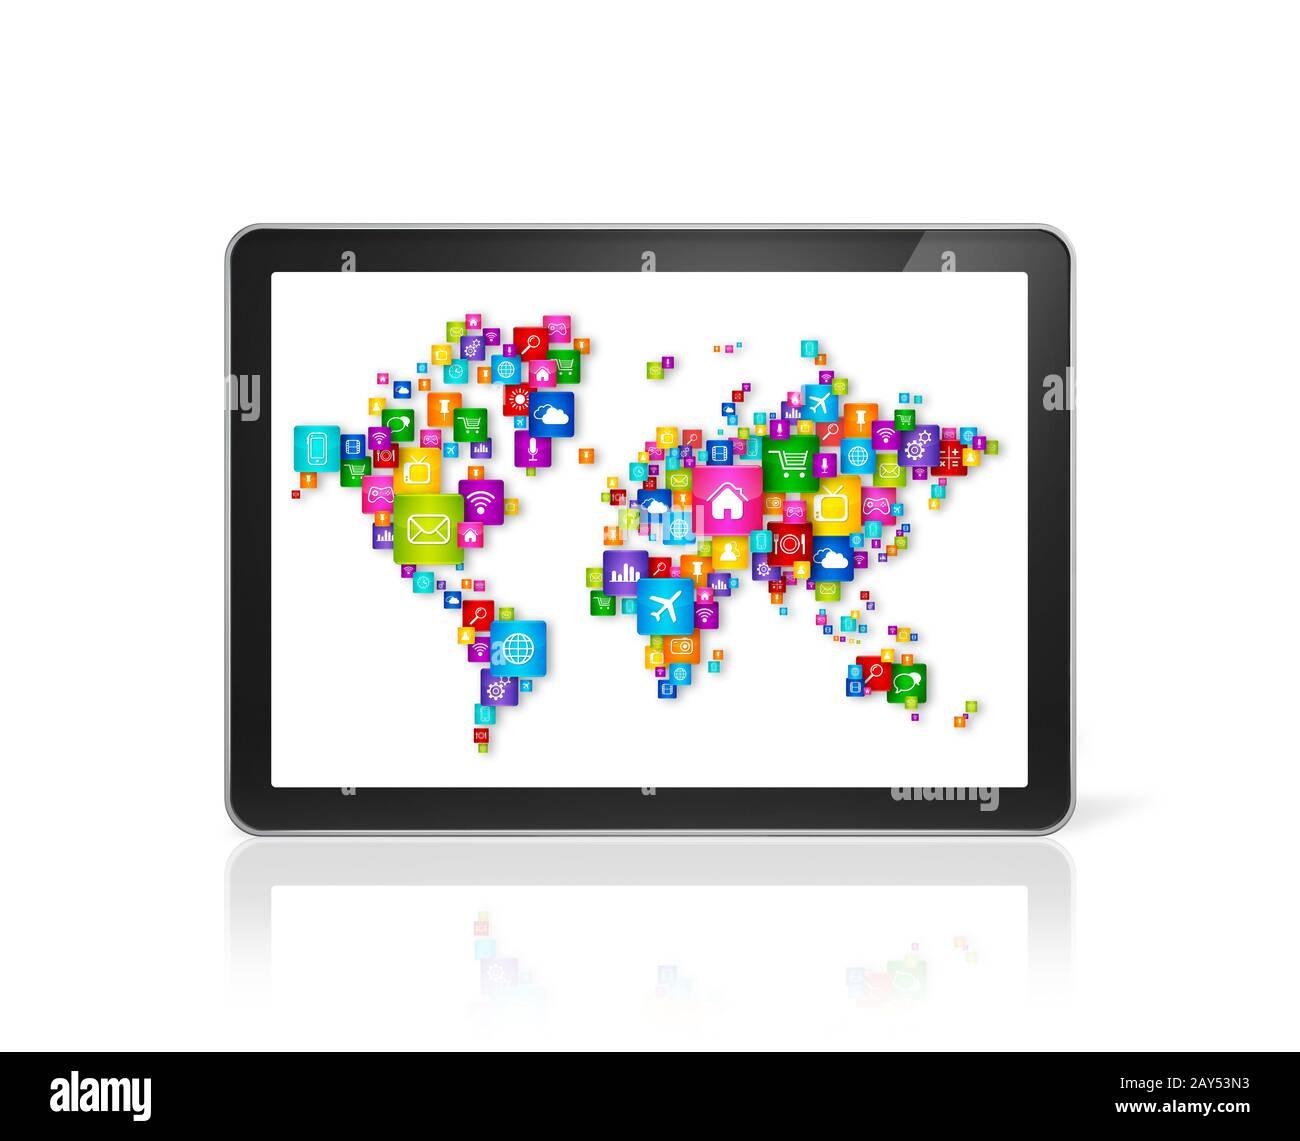 Weltkarte aus Symbole auf digitale Tablet-PC. Cloud Computing Konzept Stockfoto